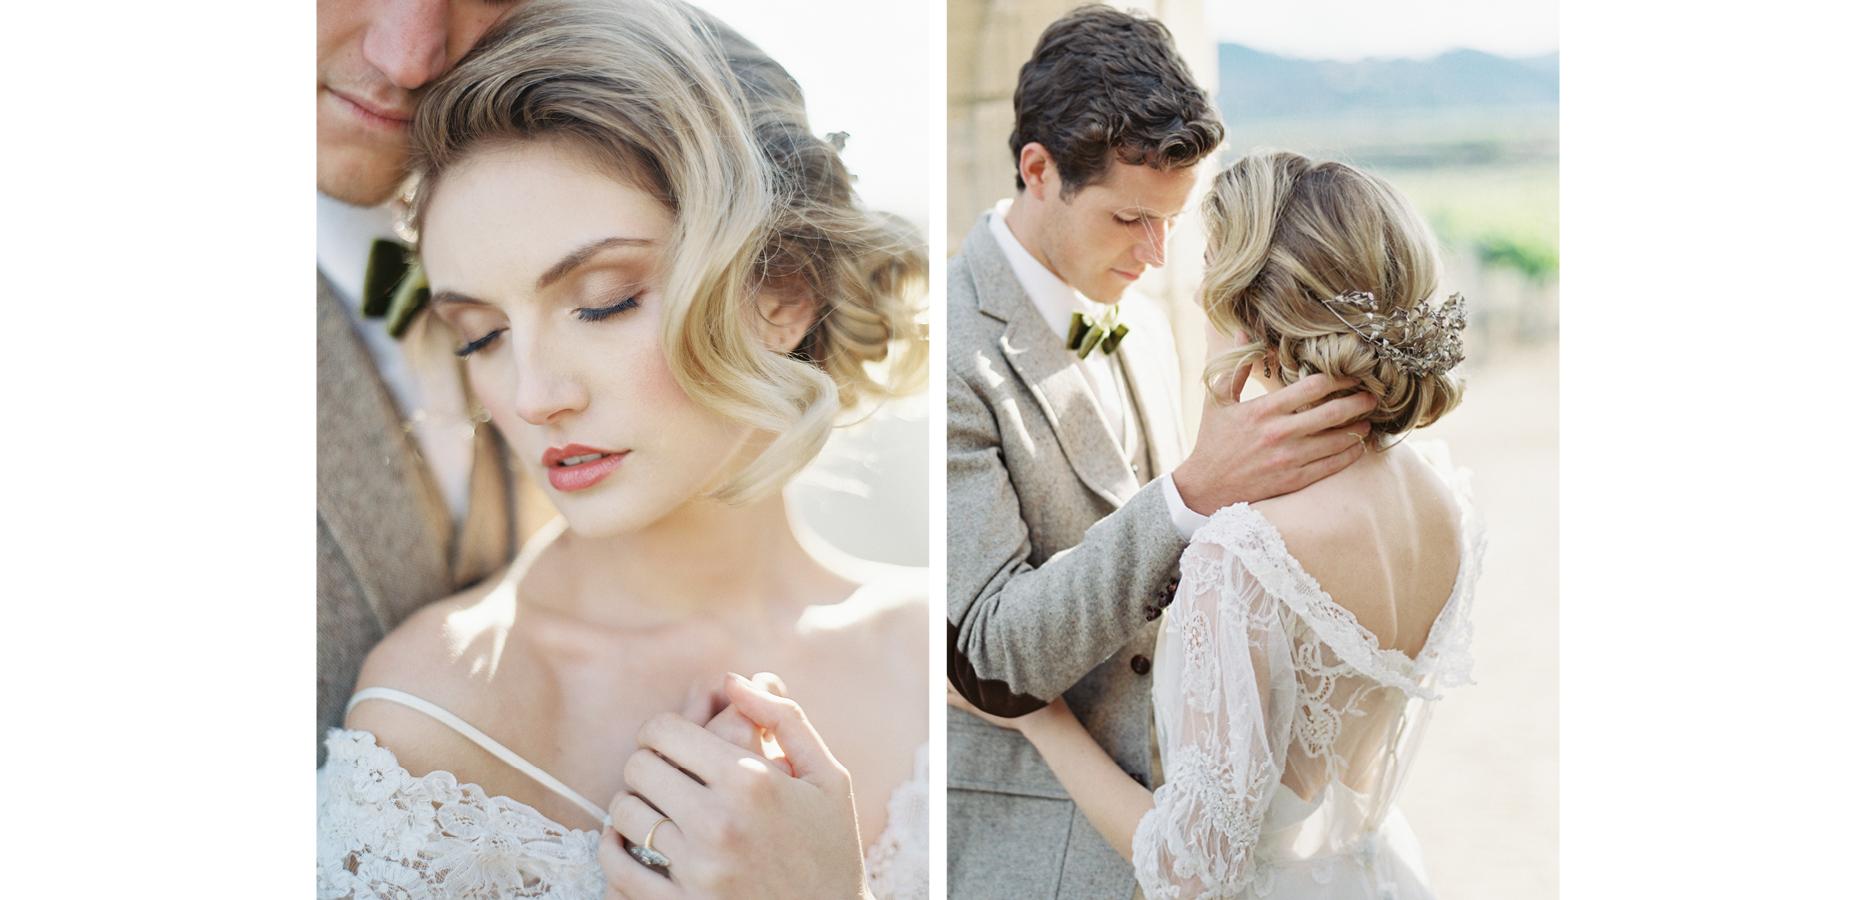 Jess-Wilcox-Hair-Makeup-Wedding_portfolio14.jpg